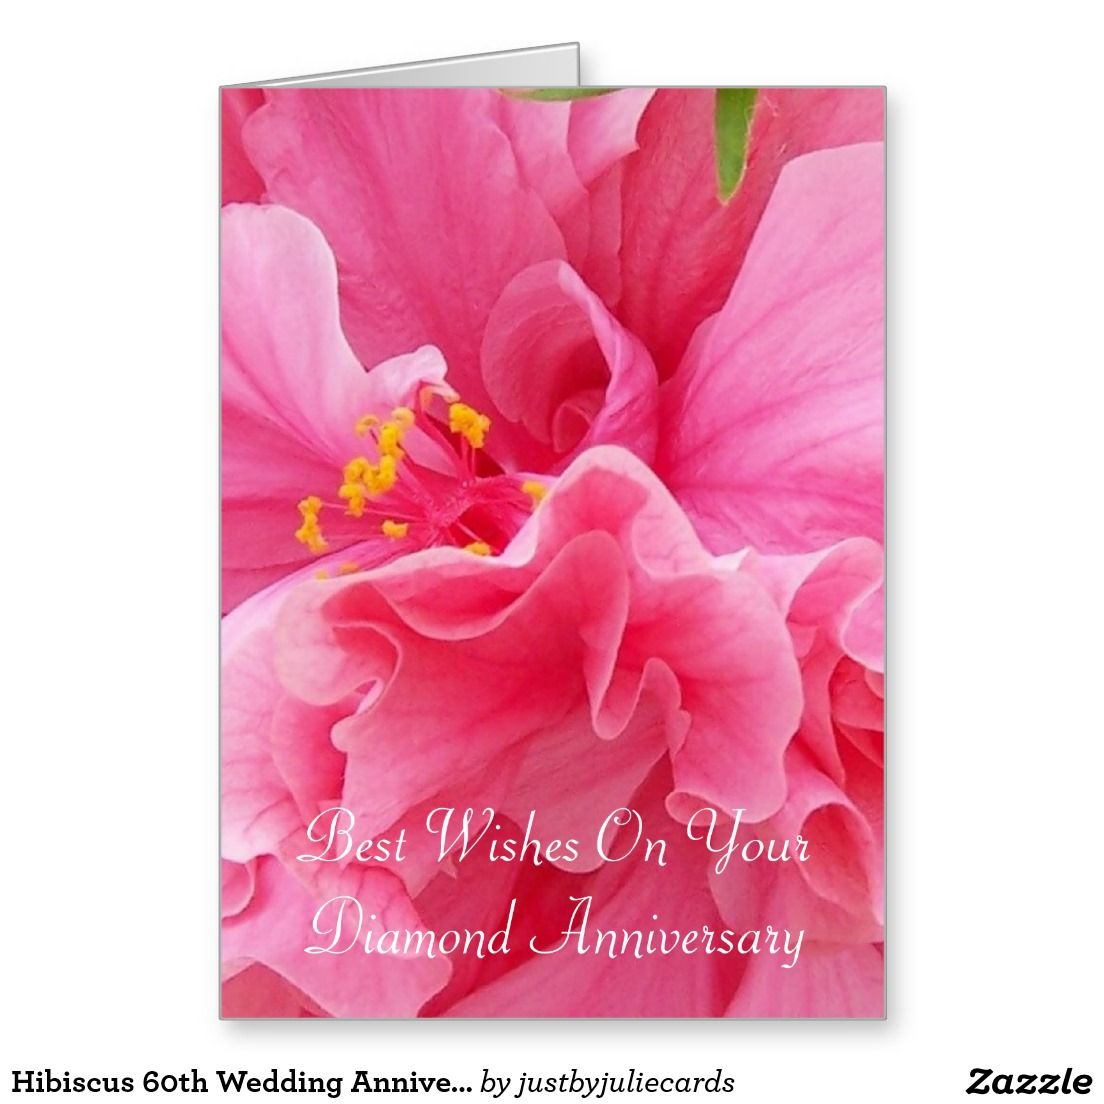 Hibiscus 60th Wedding Anniversary Wedding Anniversary Cards